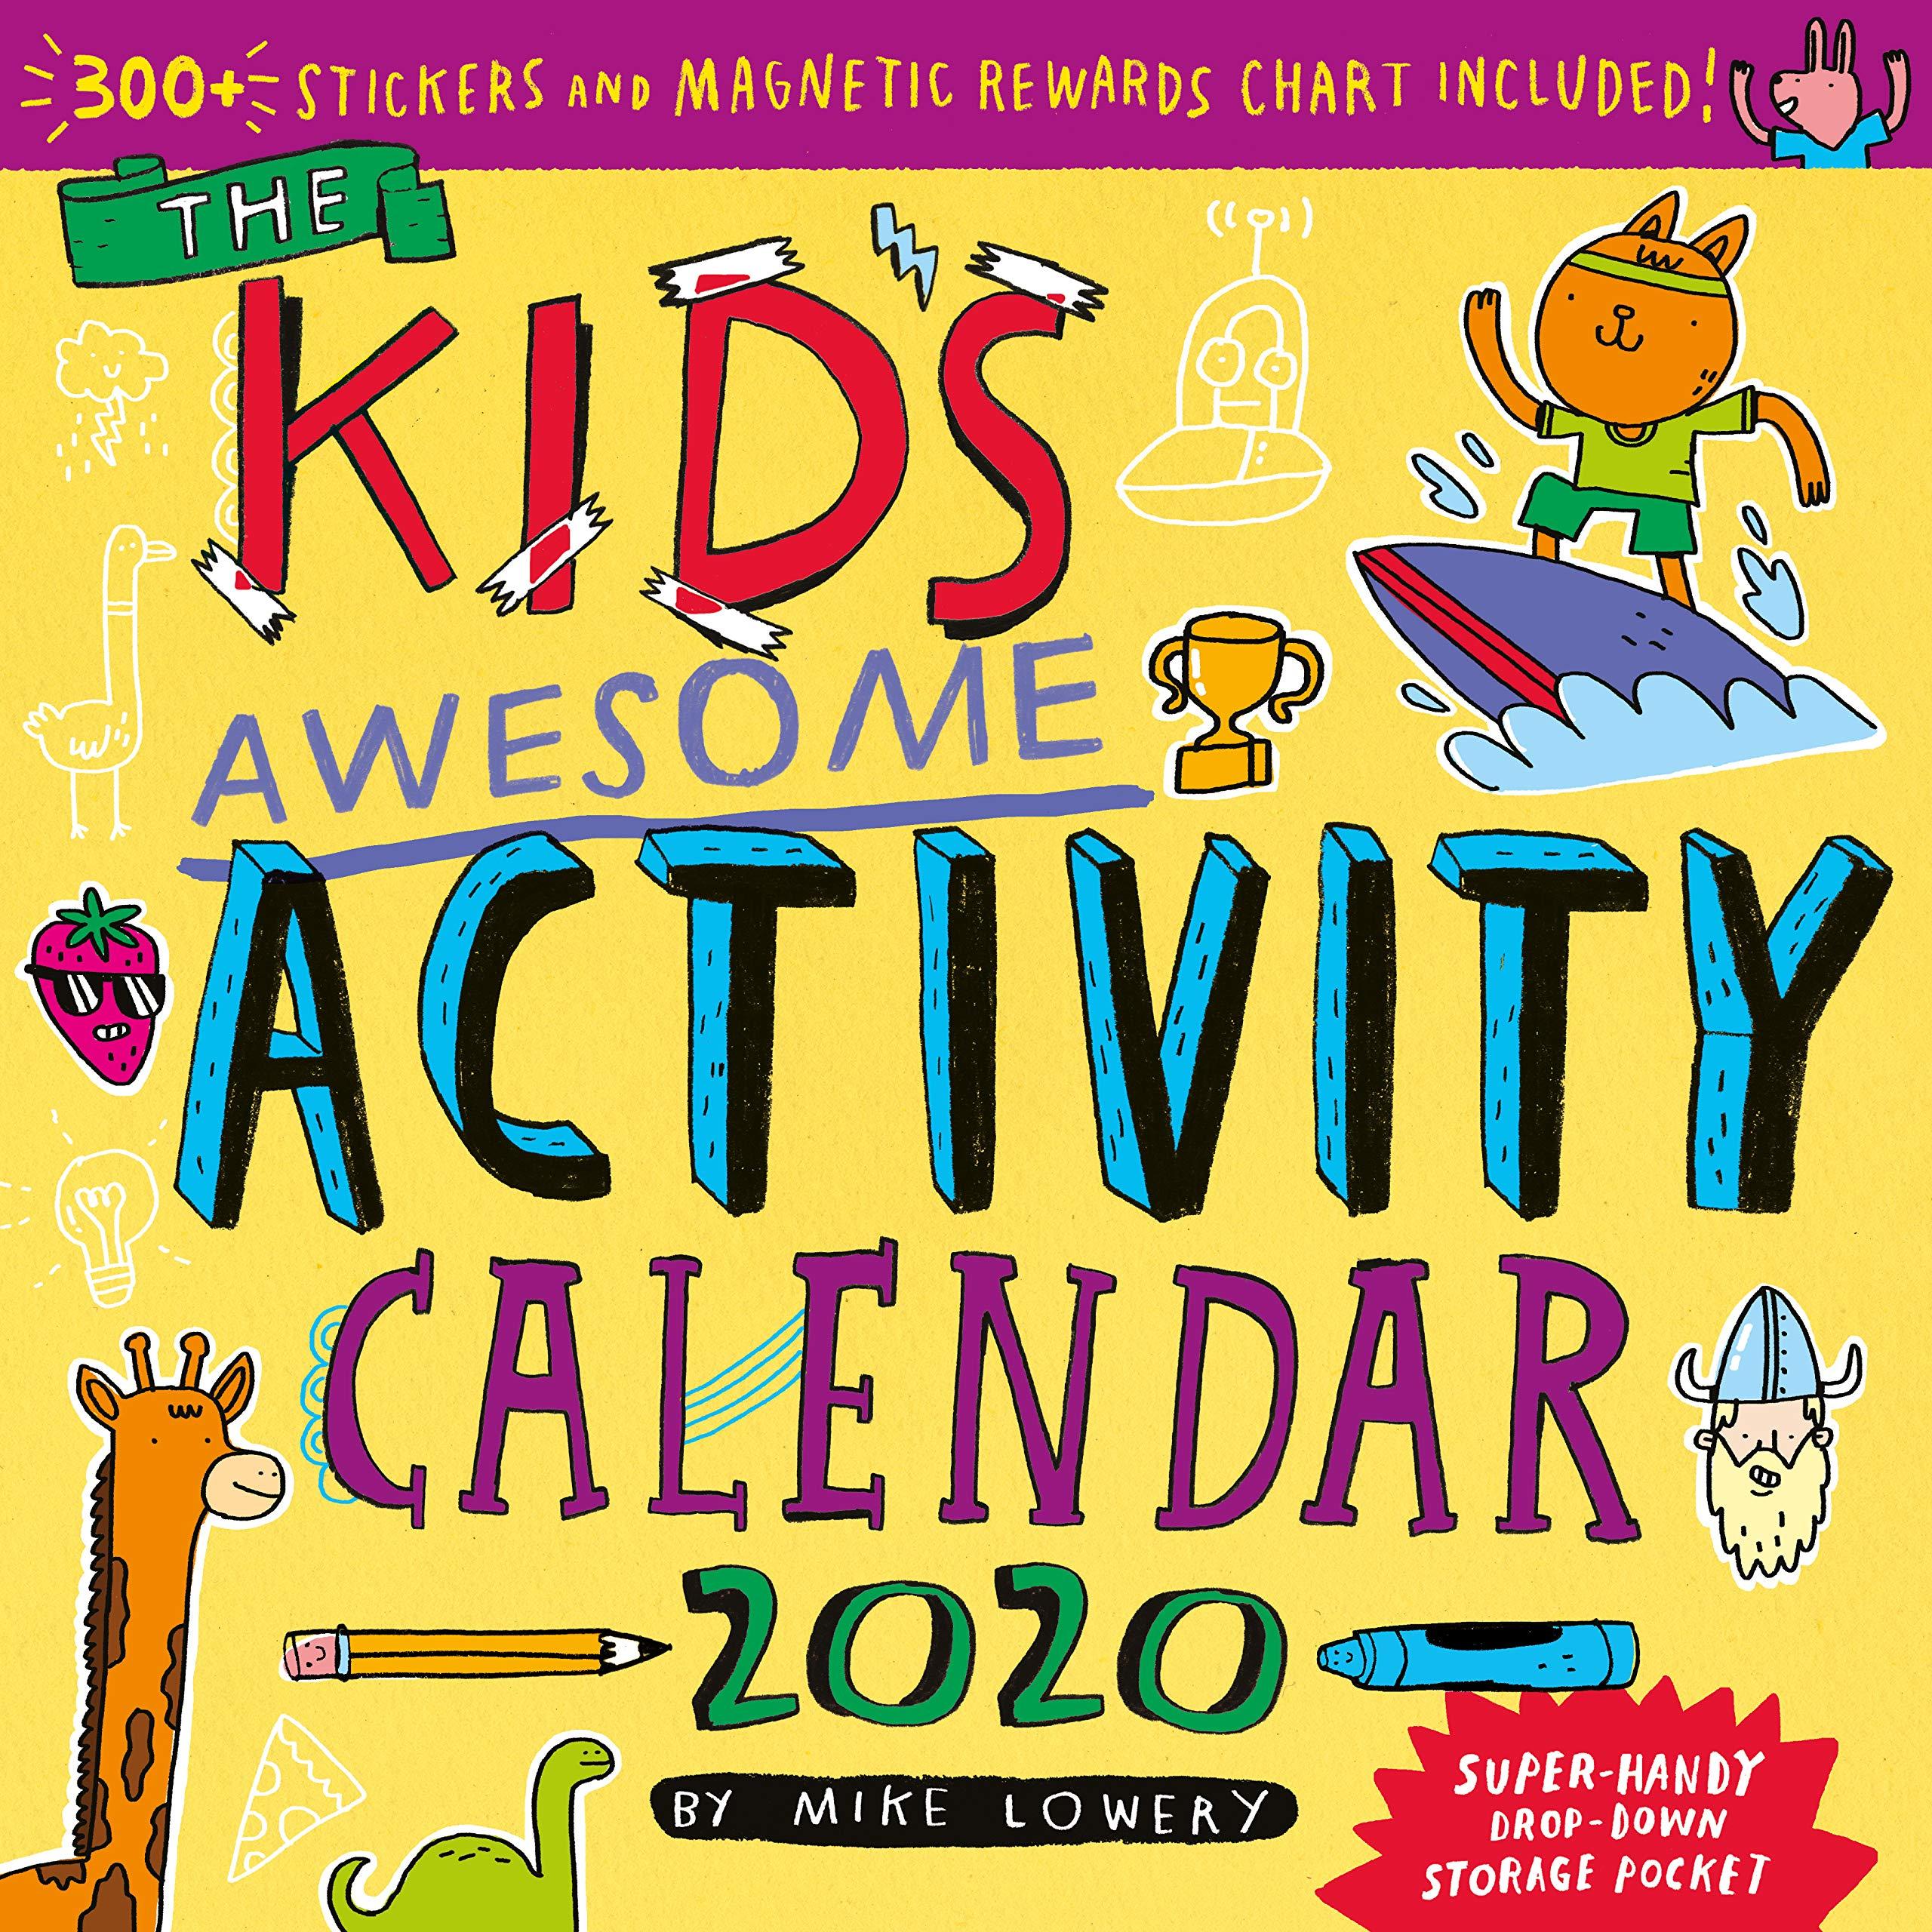 2020: Calendar: Month Of December Stock Illustration - Illustration of month,  wire: 166976829